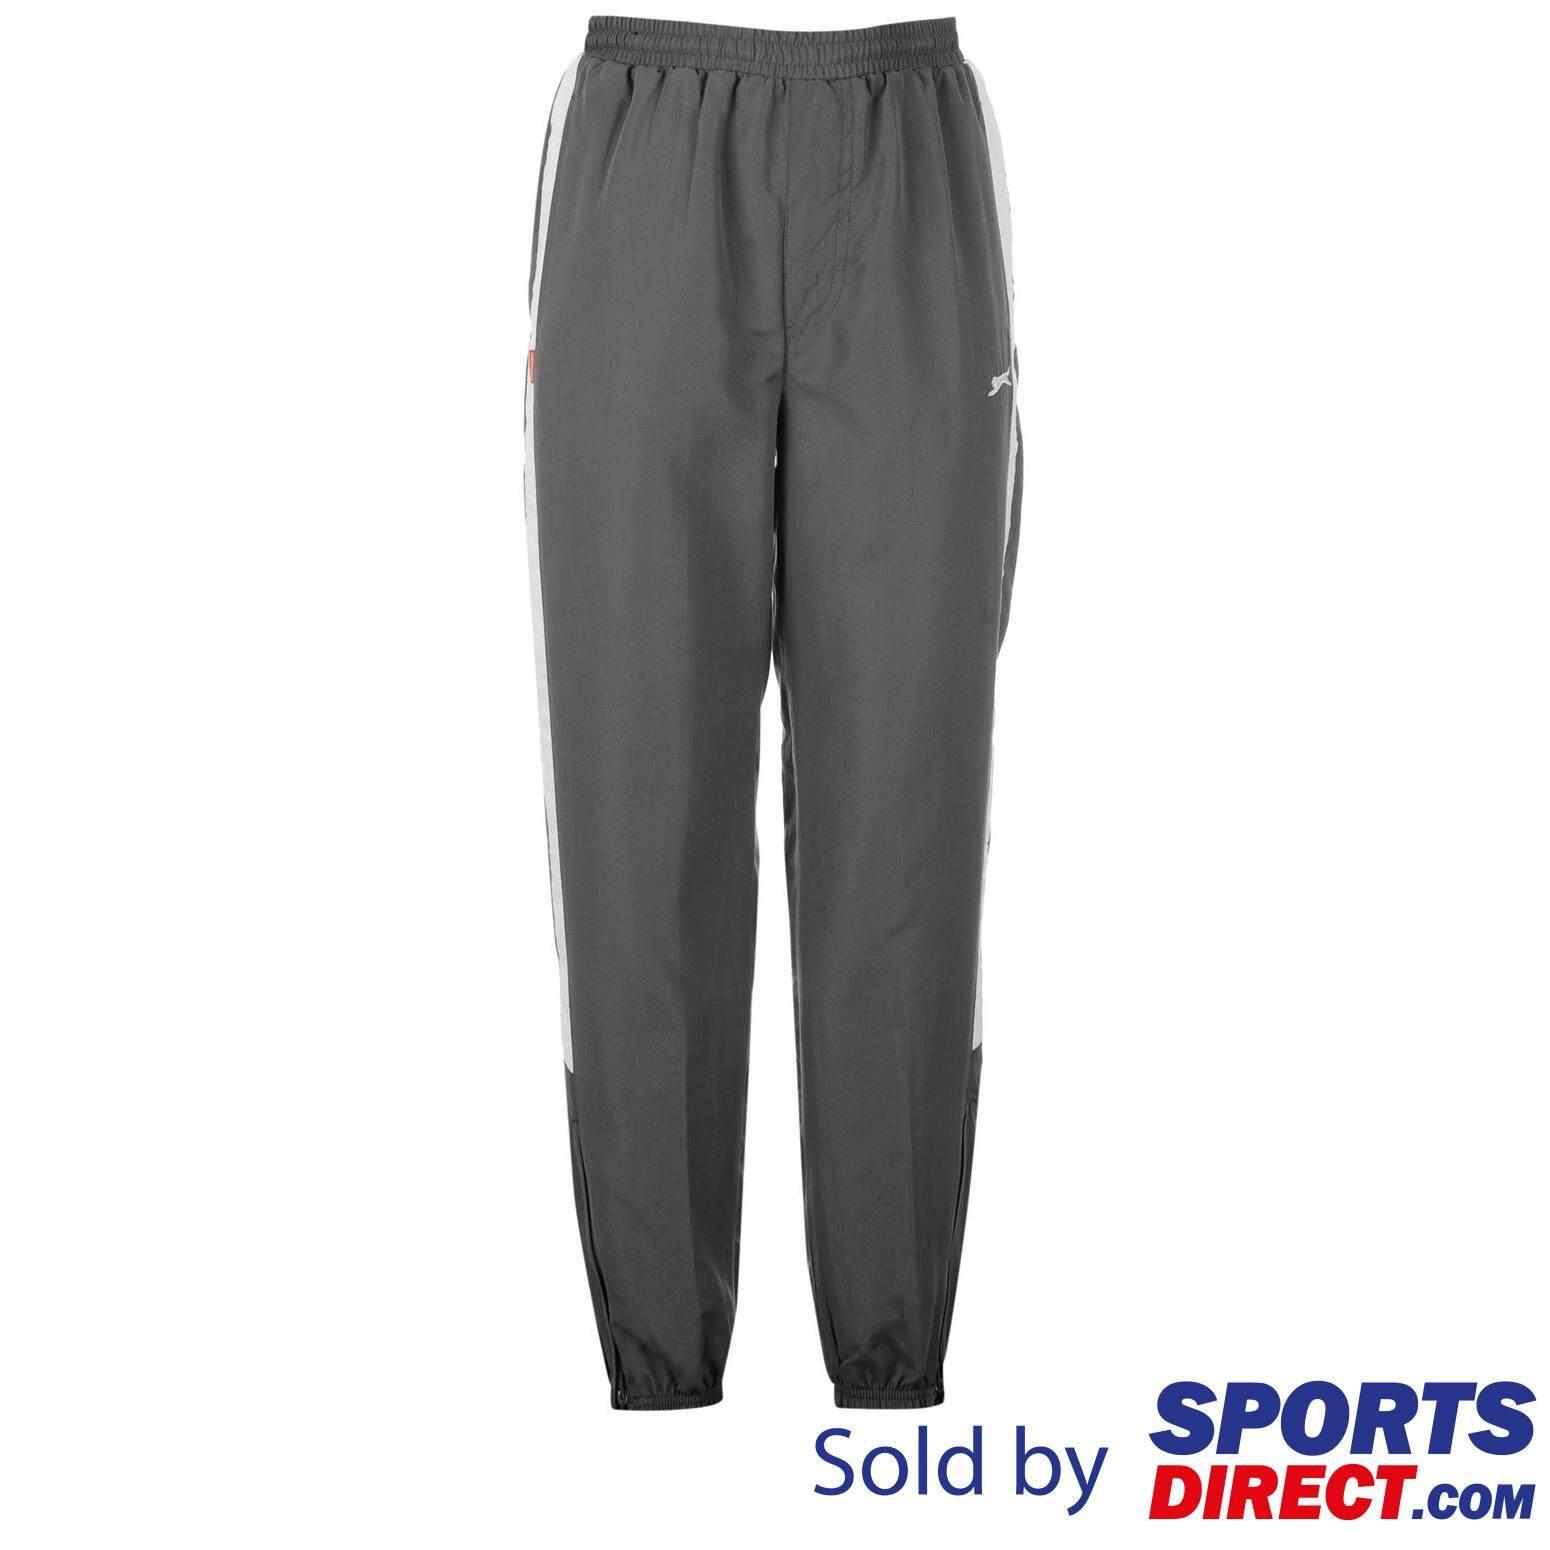 Slazenger Closed Hem Woven Pants Juniors (charcoal) By Sports Direct Mst Sdn Bhd.